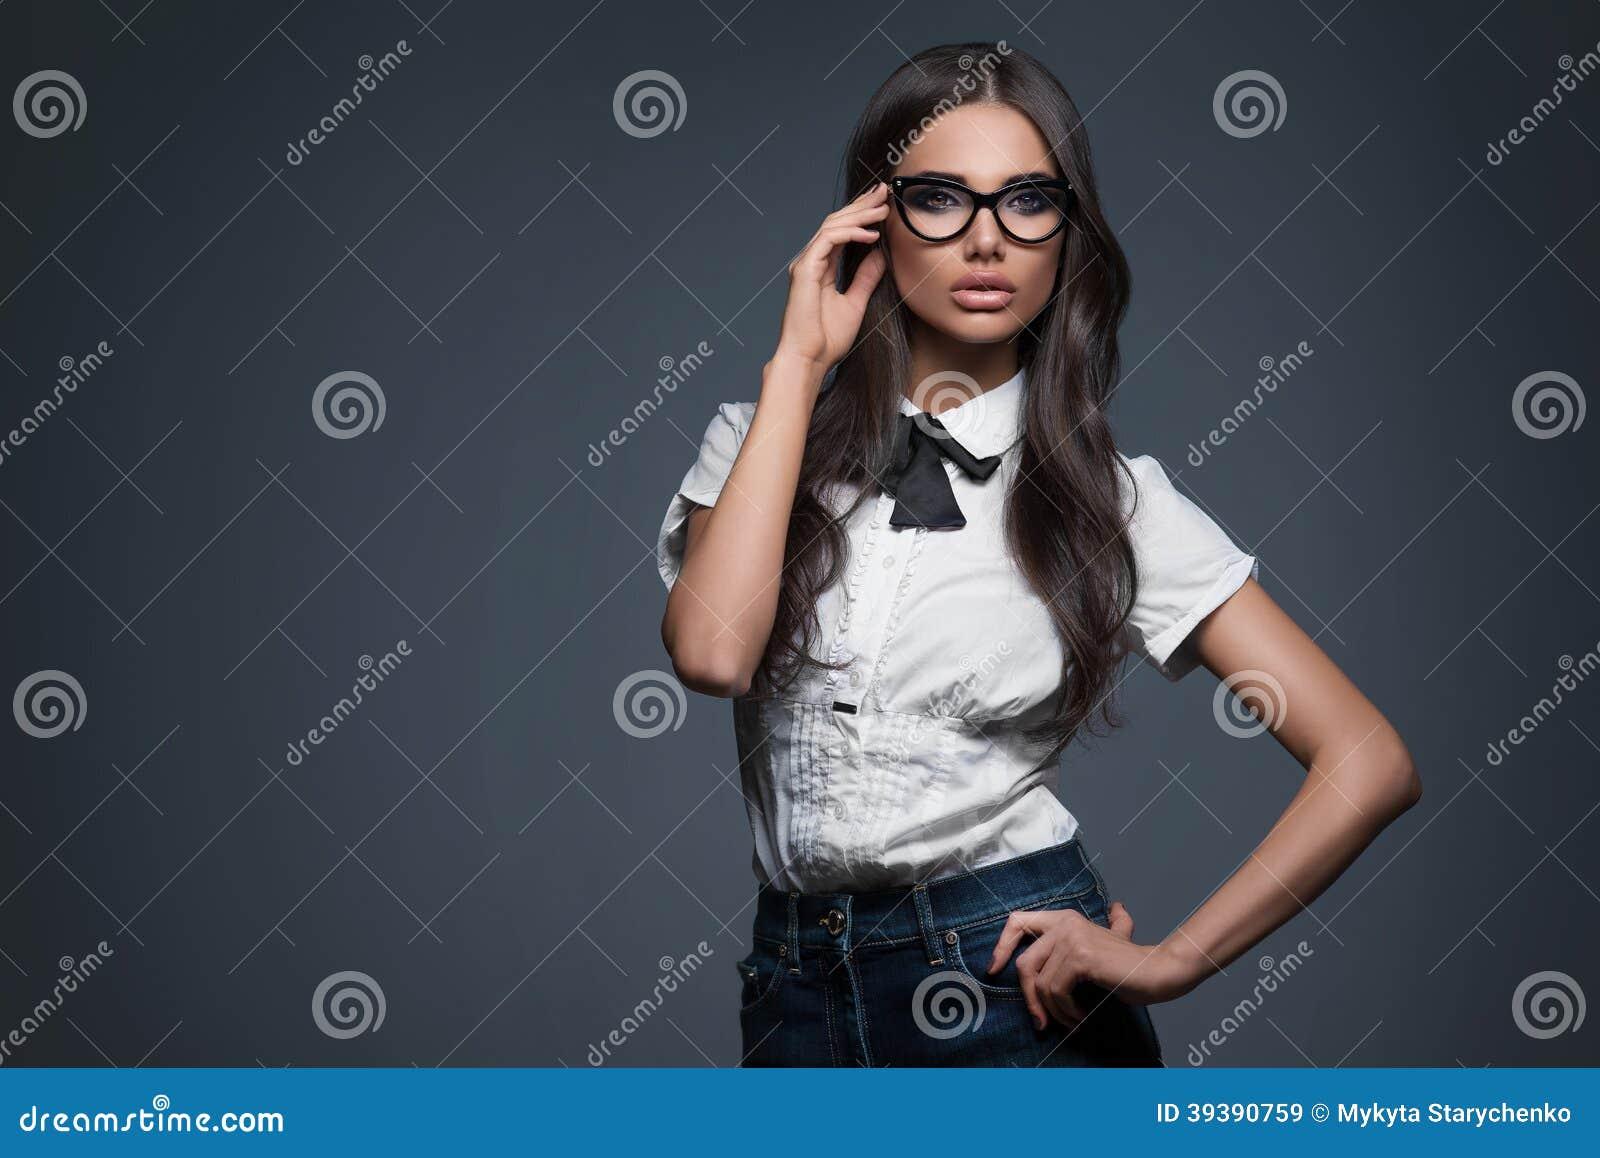 elegant woman in glasses